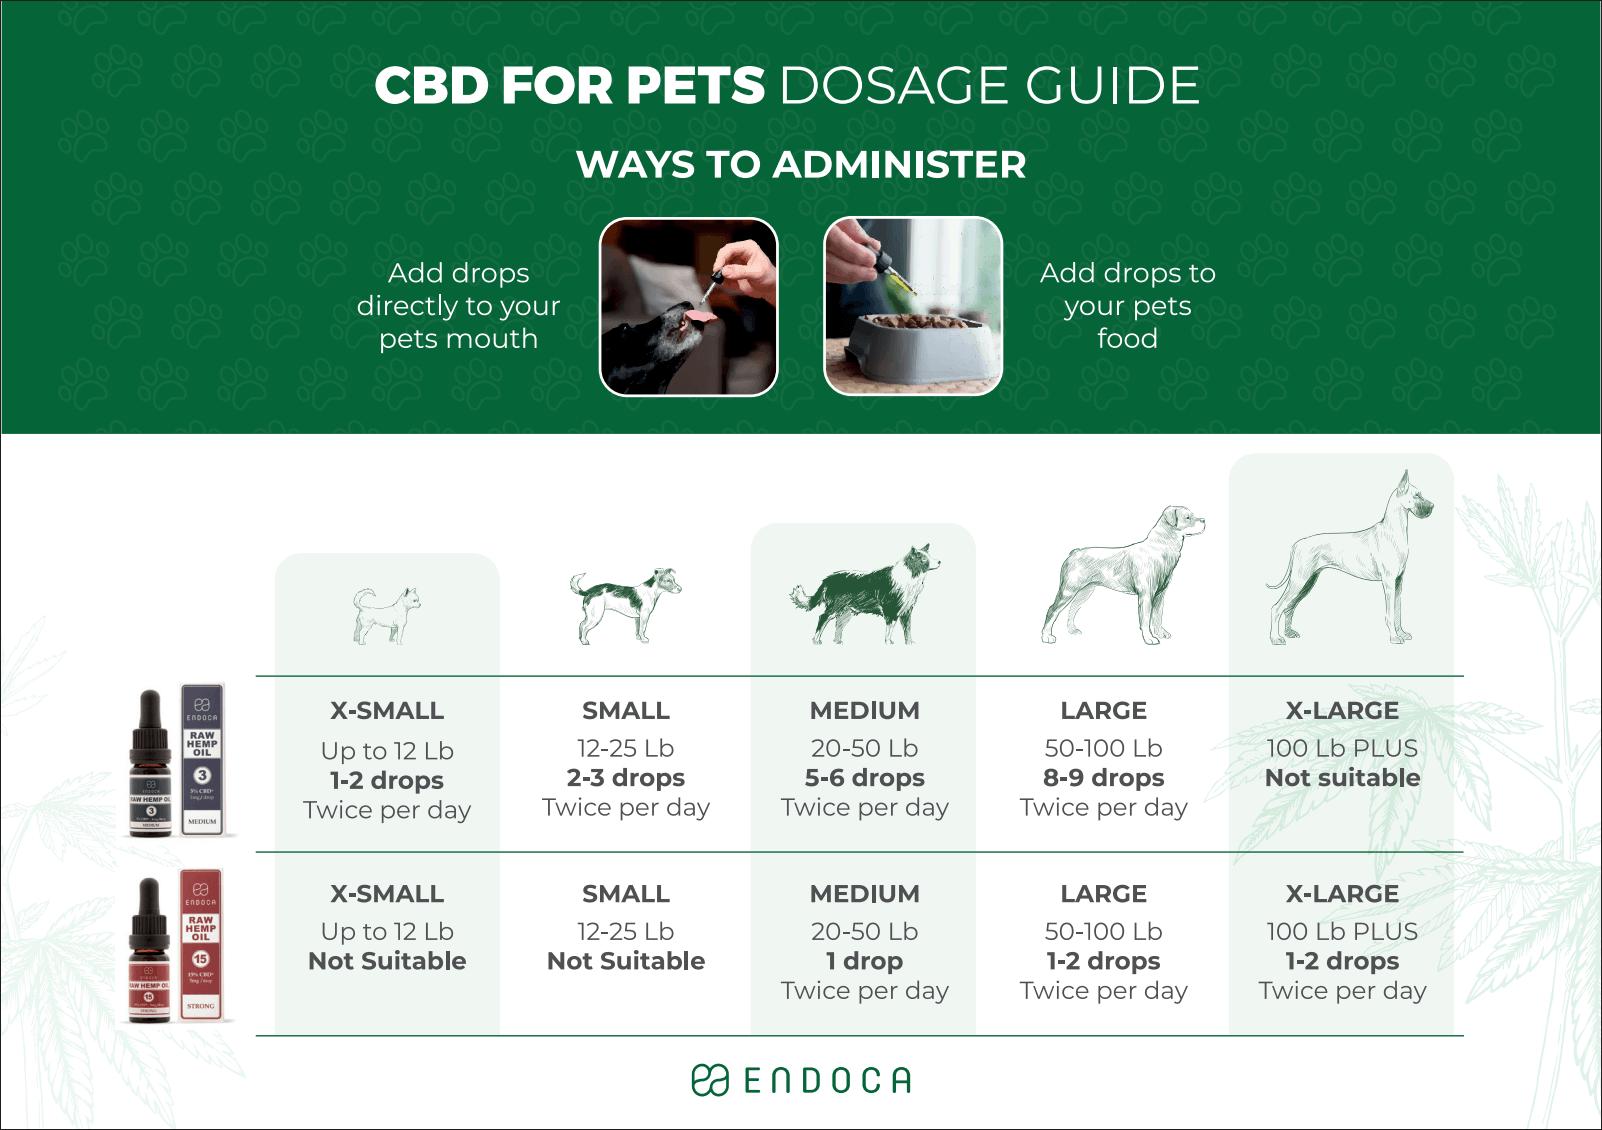 CBD for pets dosage guide